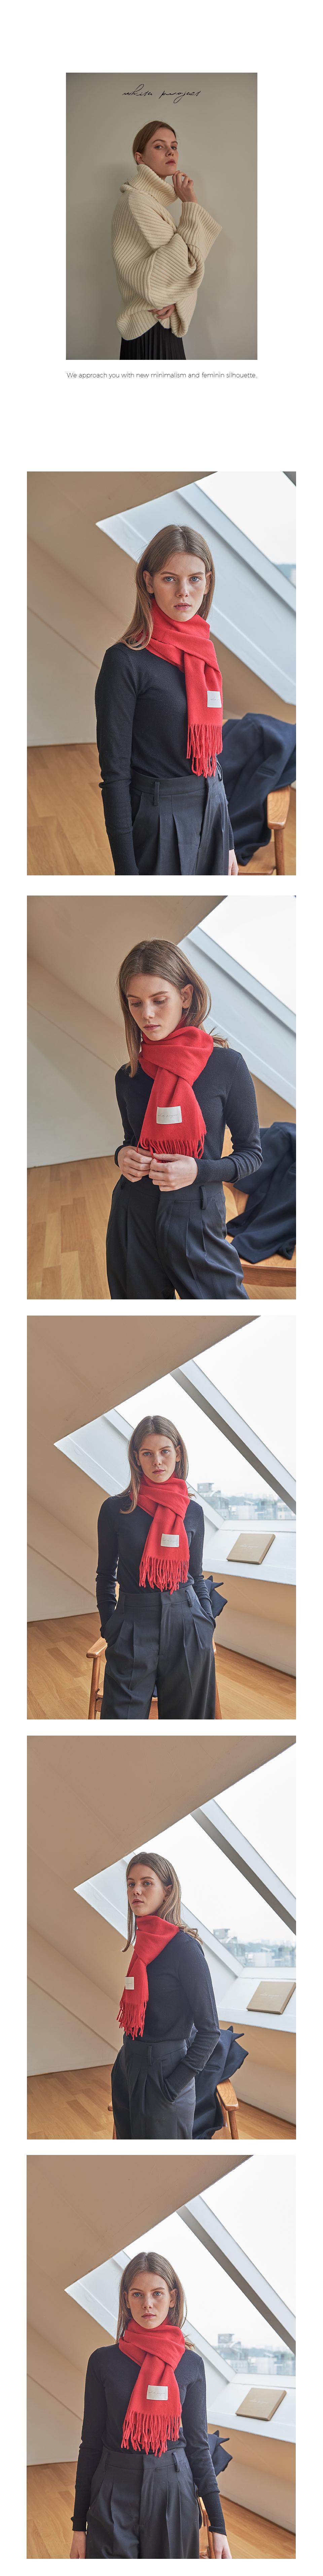 cashmere+red01.jpg